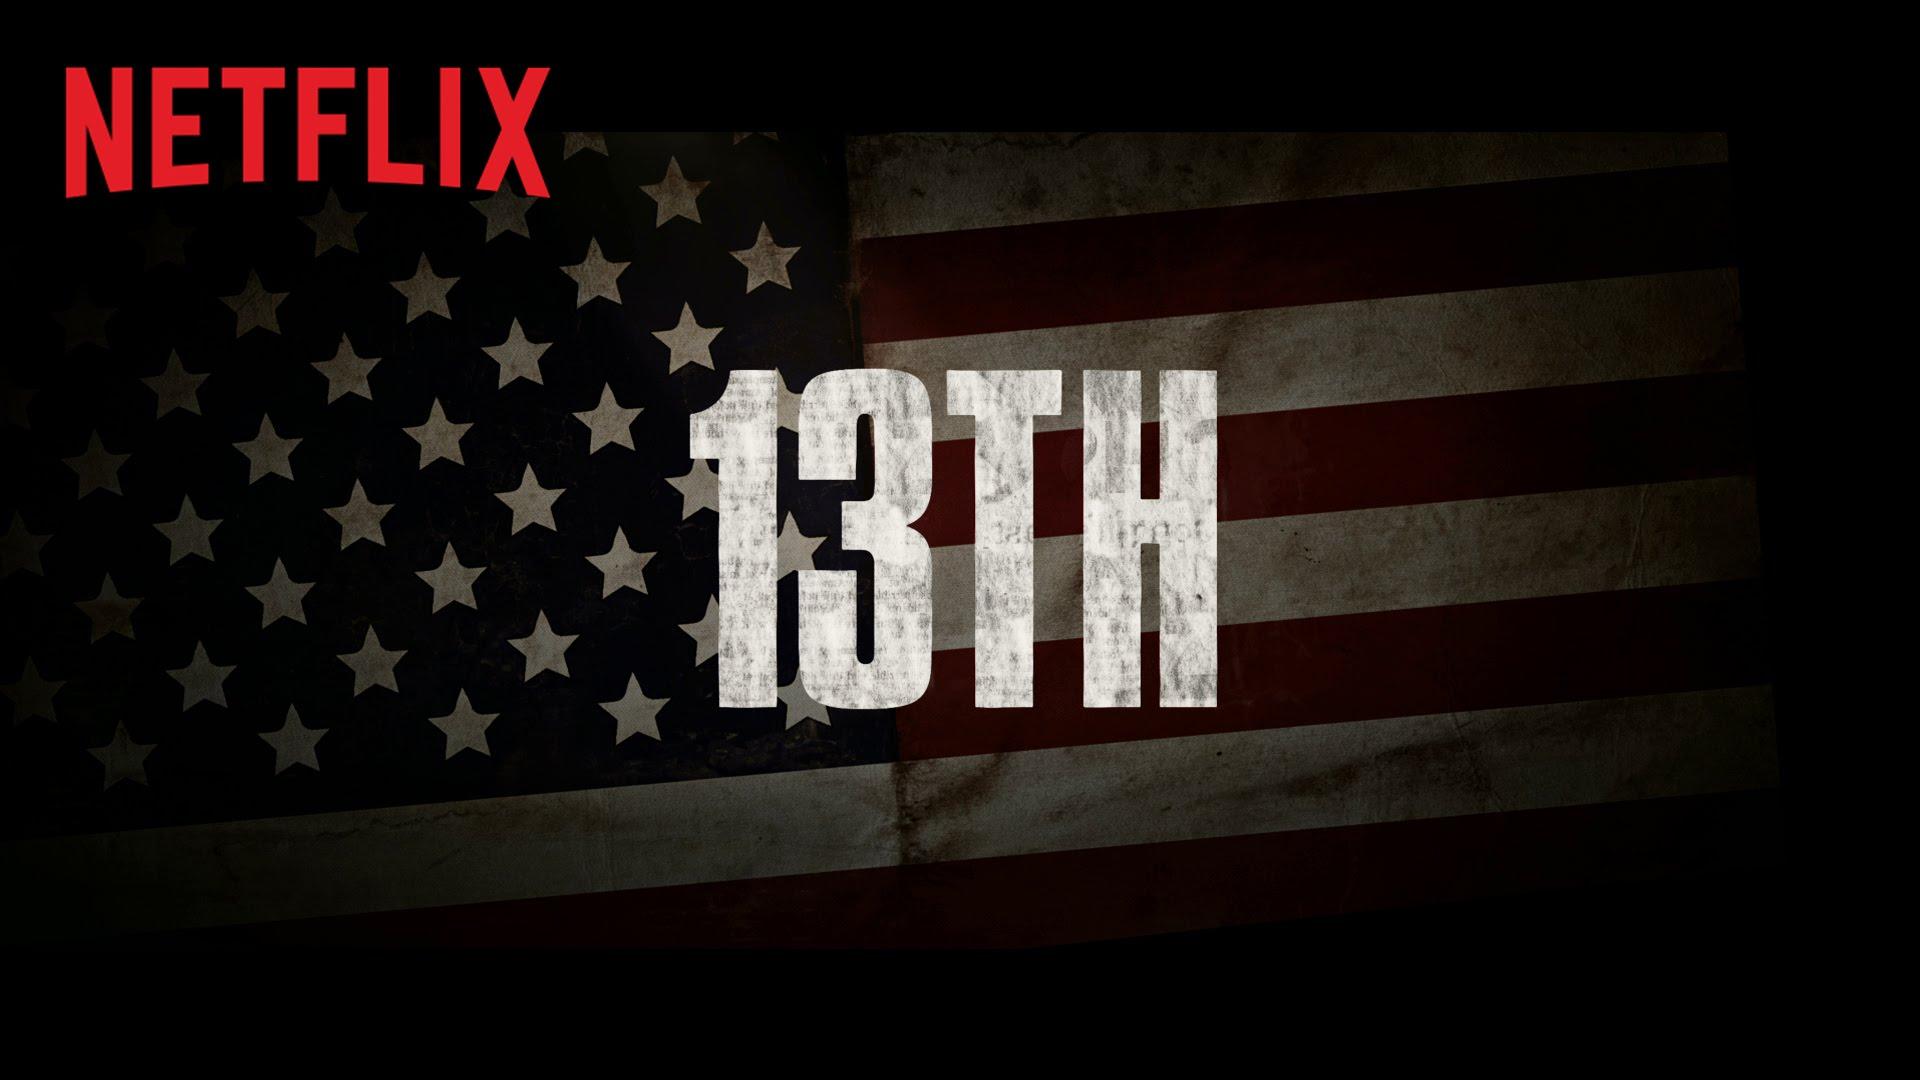 13th Trailer